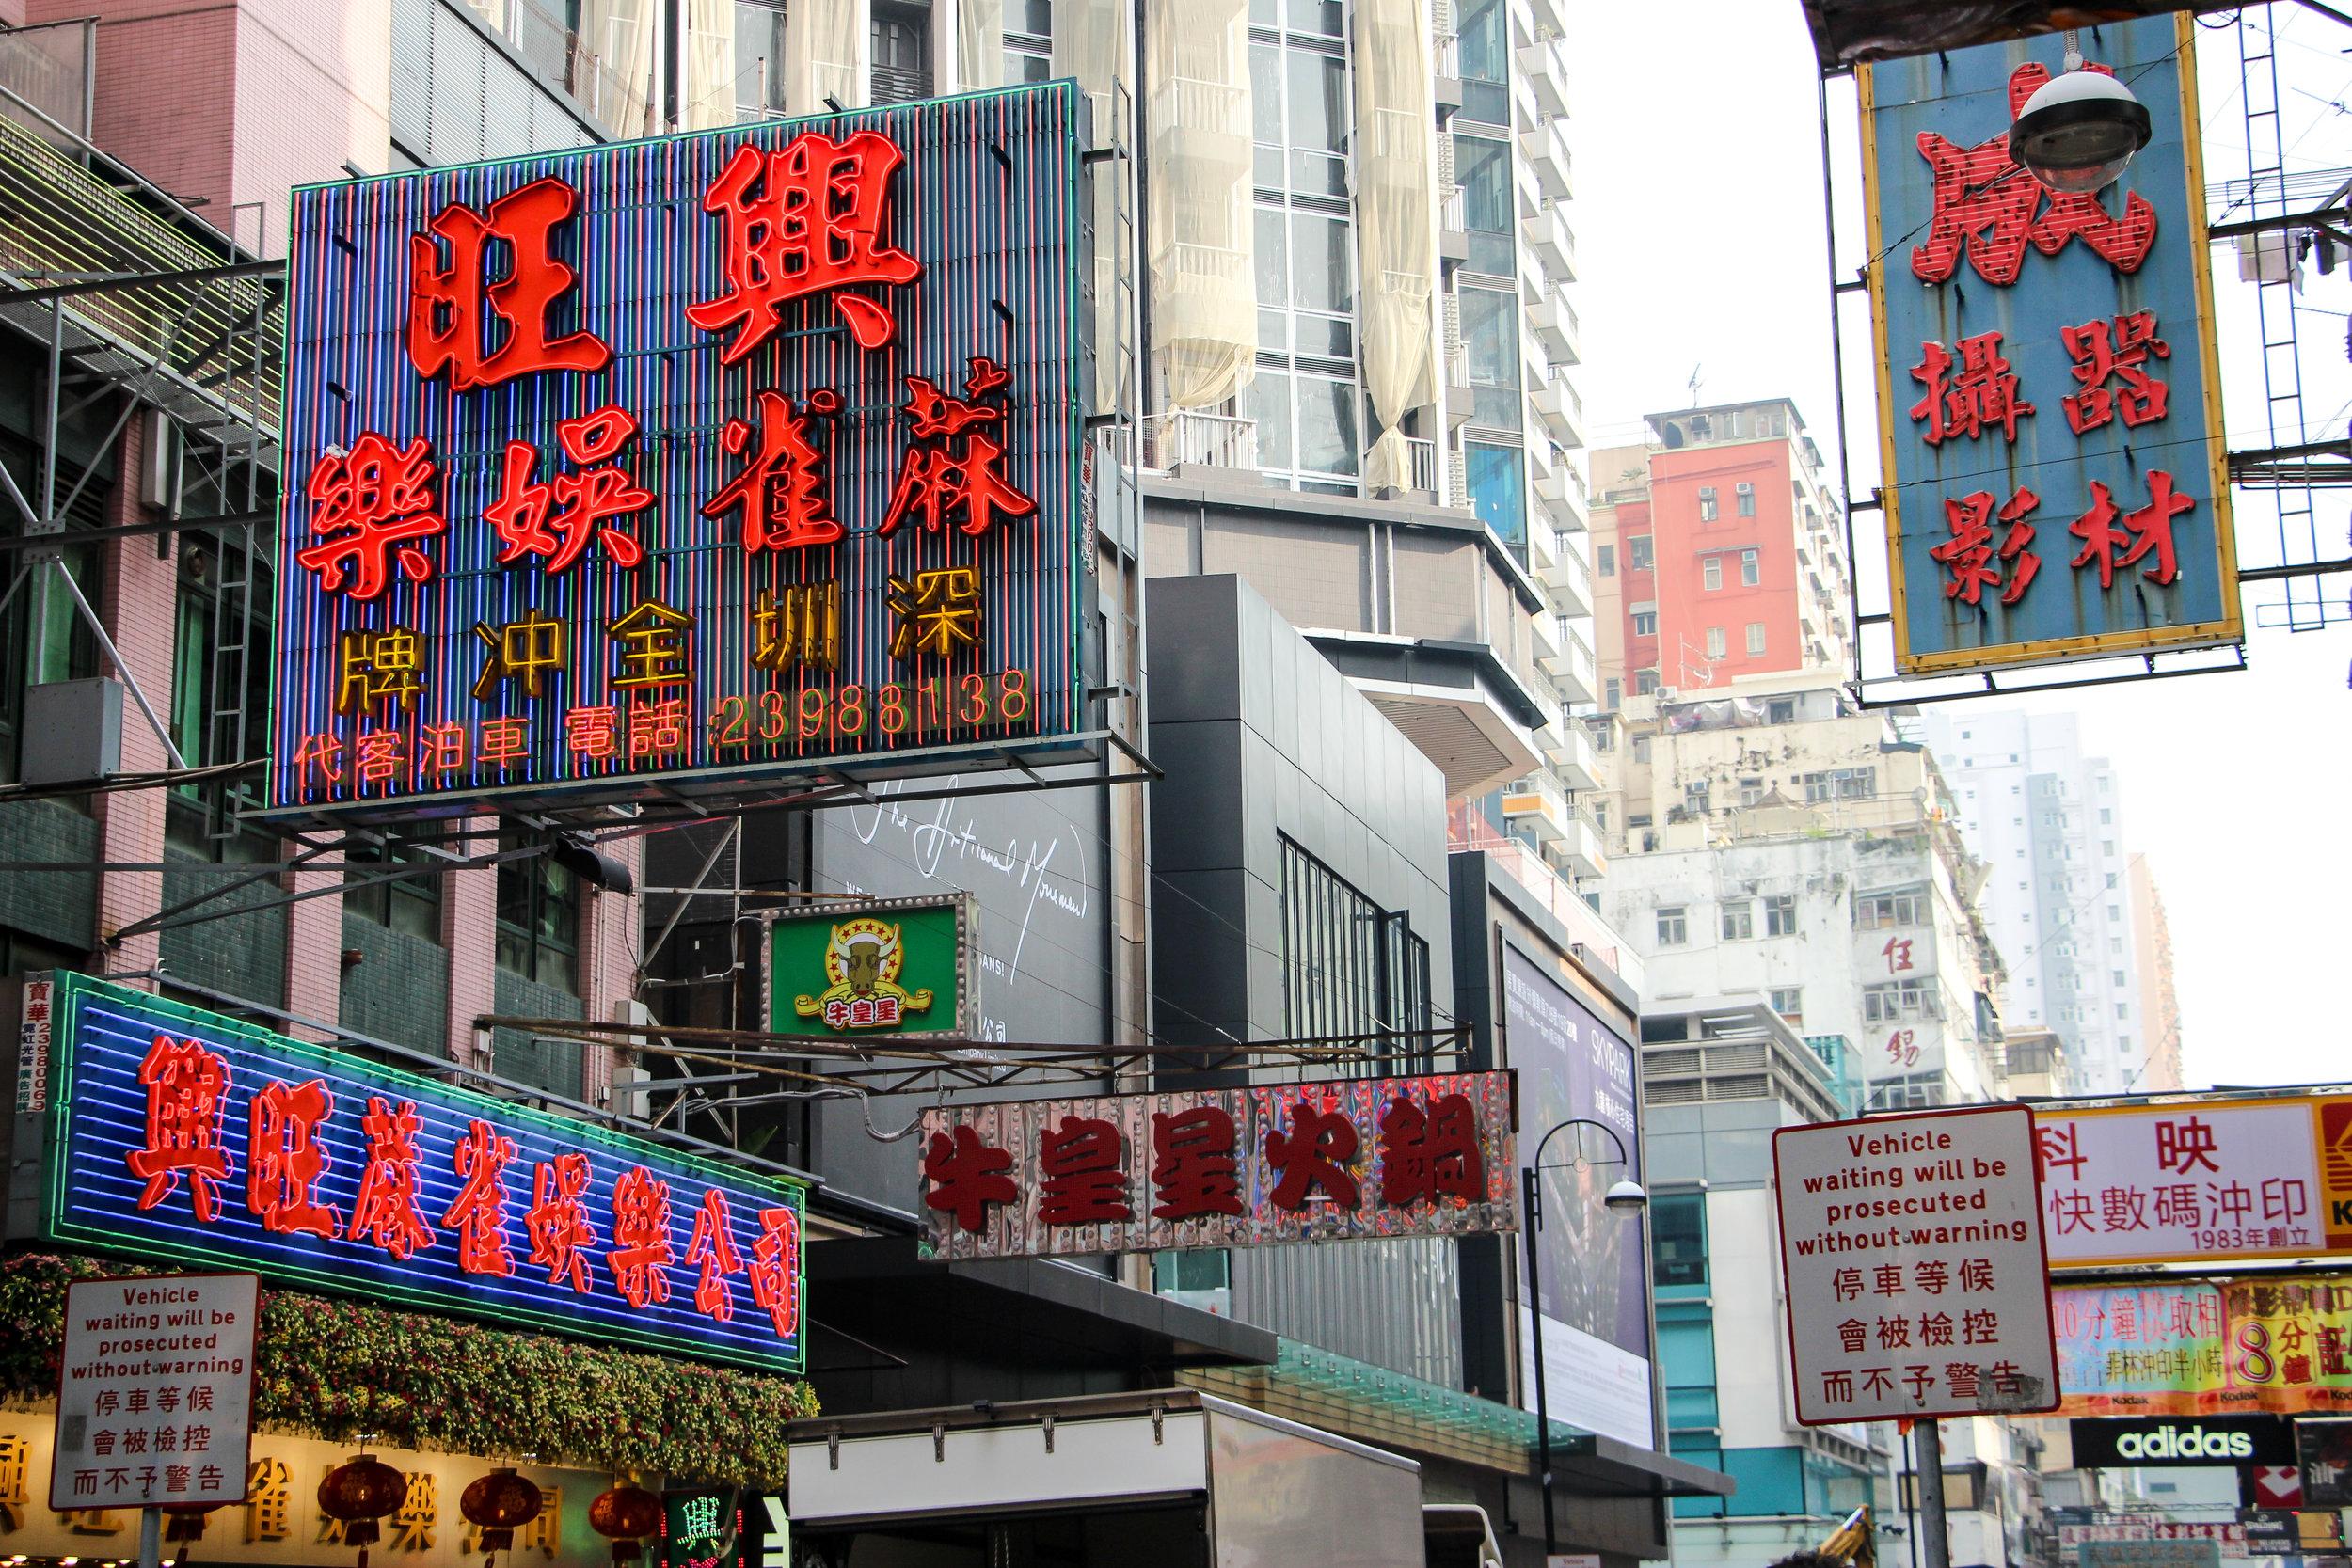 Hong Kong, Kowloon, street photography, advertisement, Asia | DoLessGetMoreDone.com |